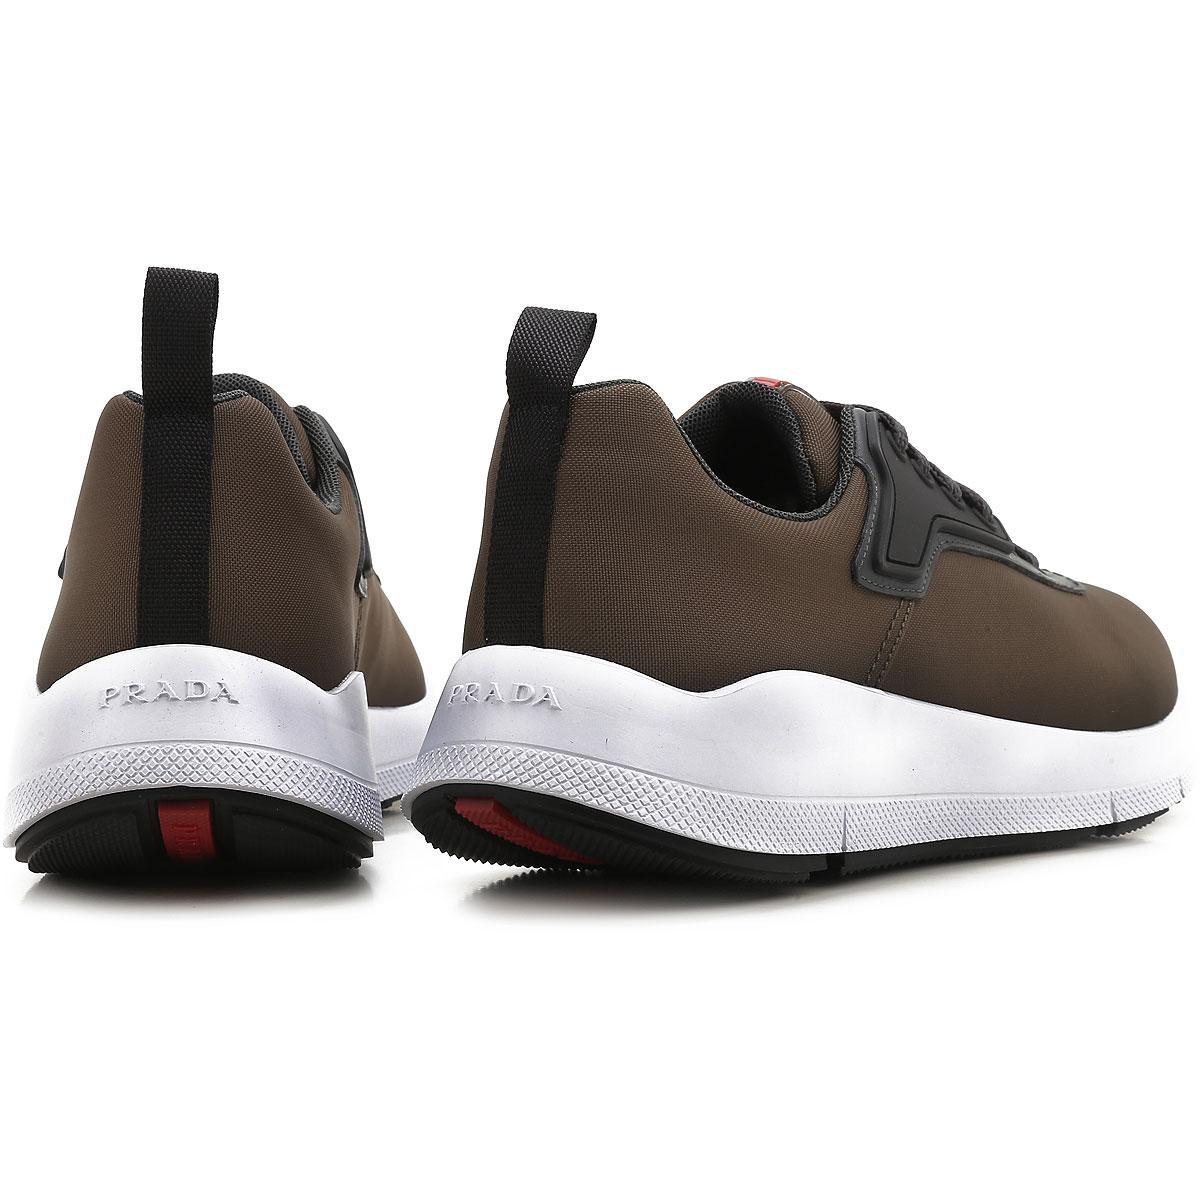 Go Prada Mens Snow Boots Association American rCqrwI